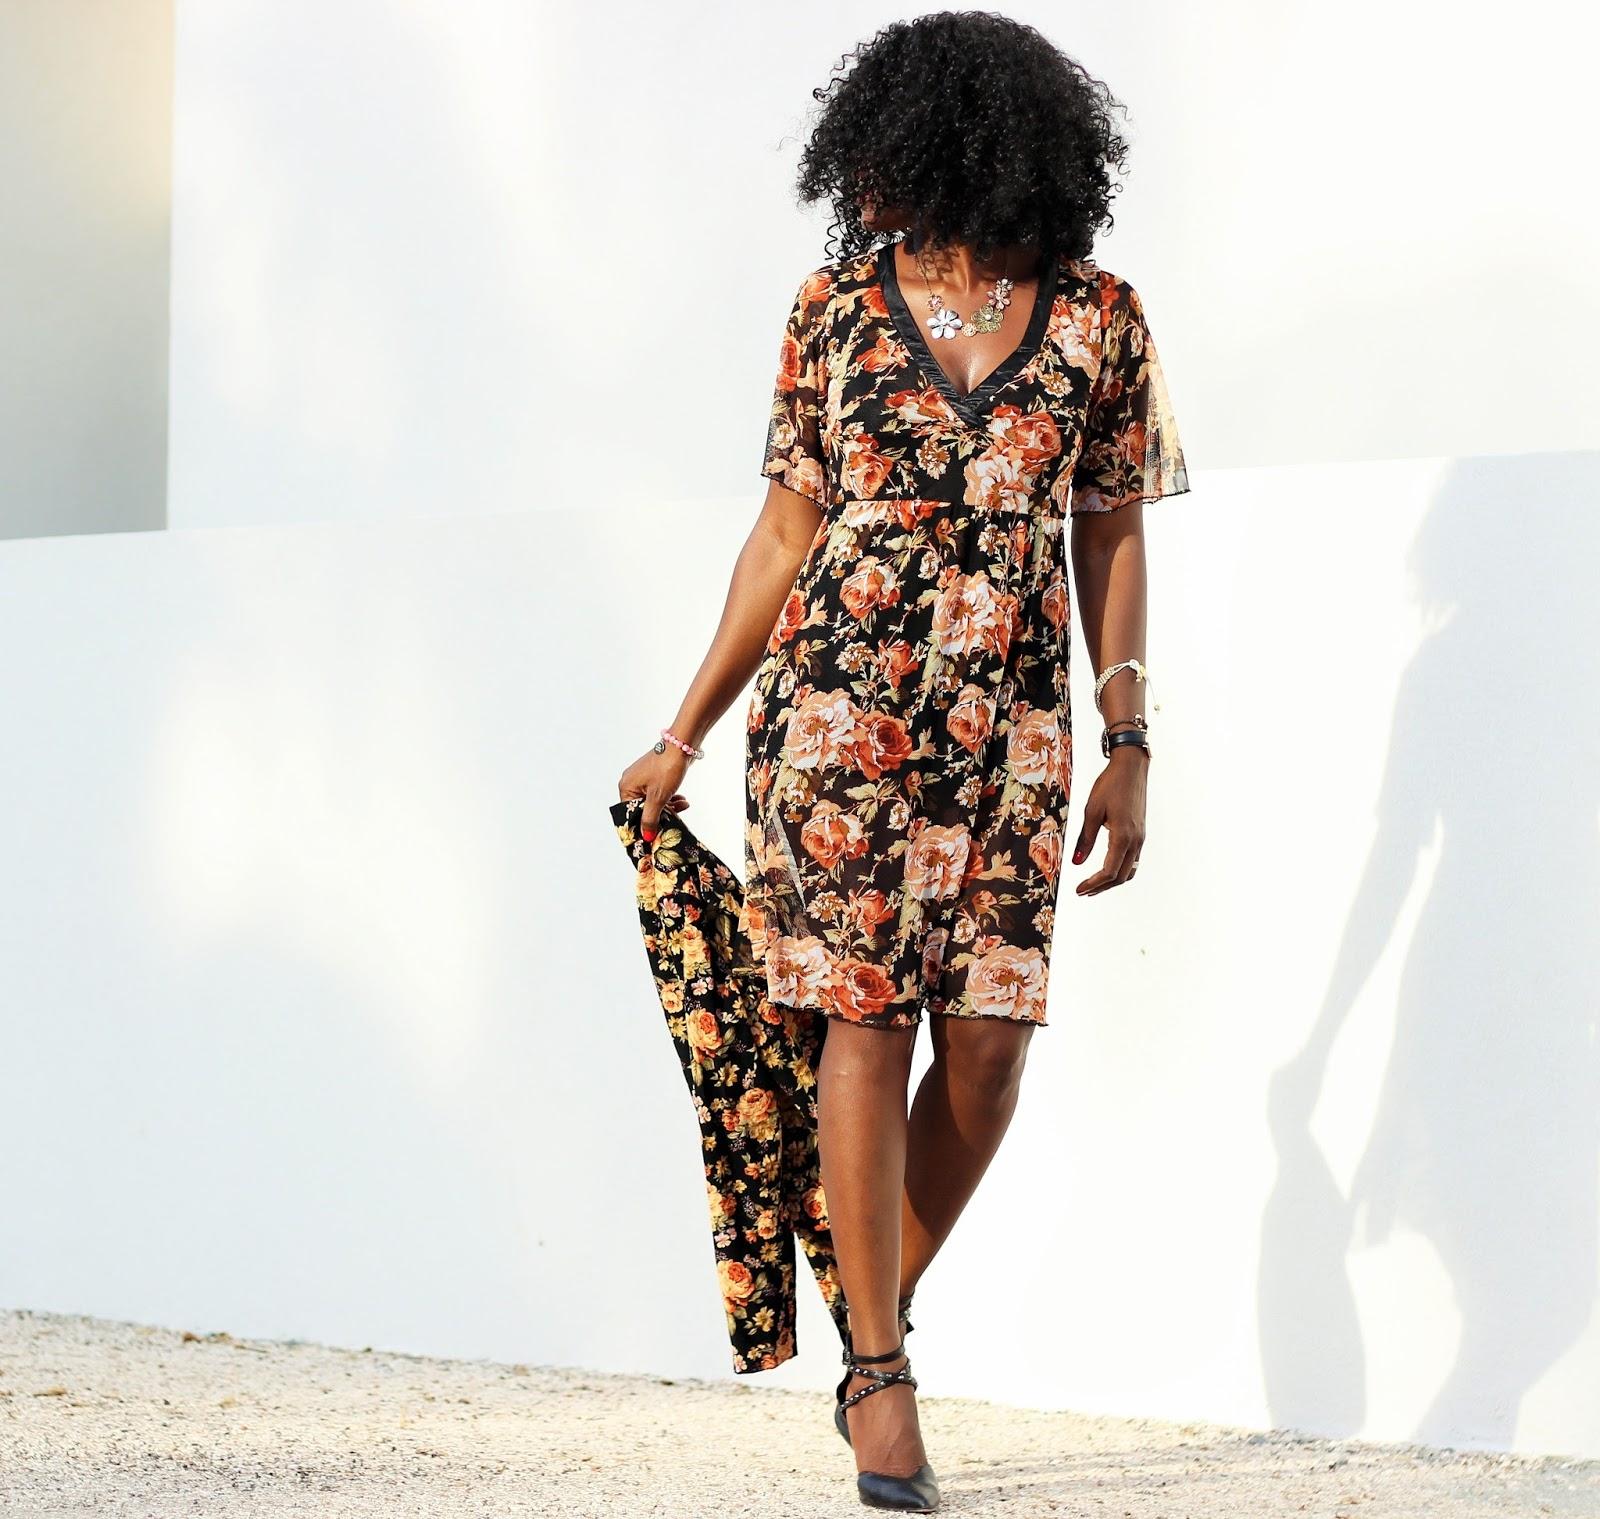 FLORAL BLAZER x FLORAL DRESS